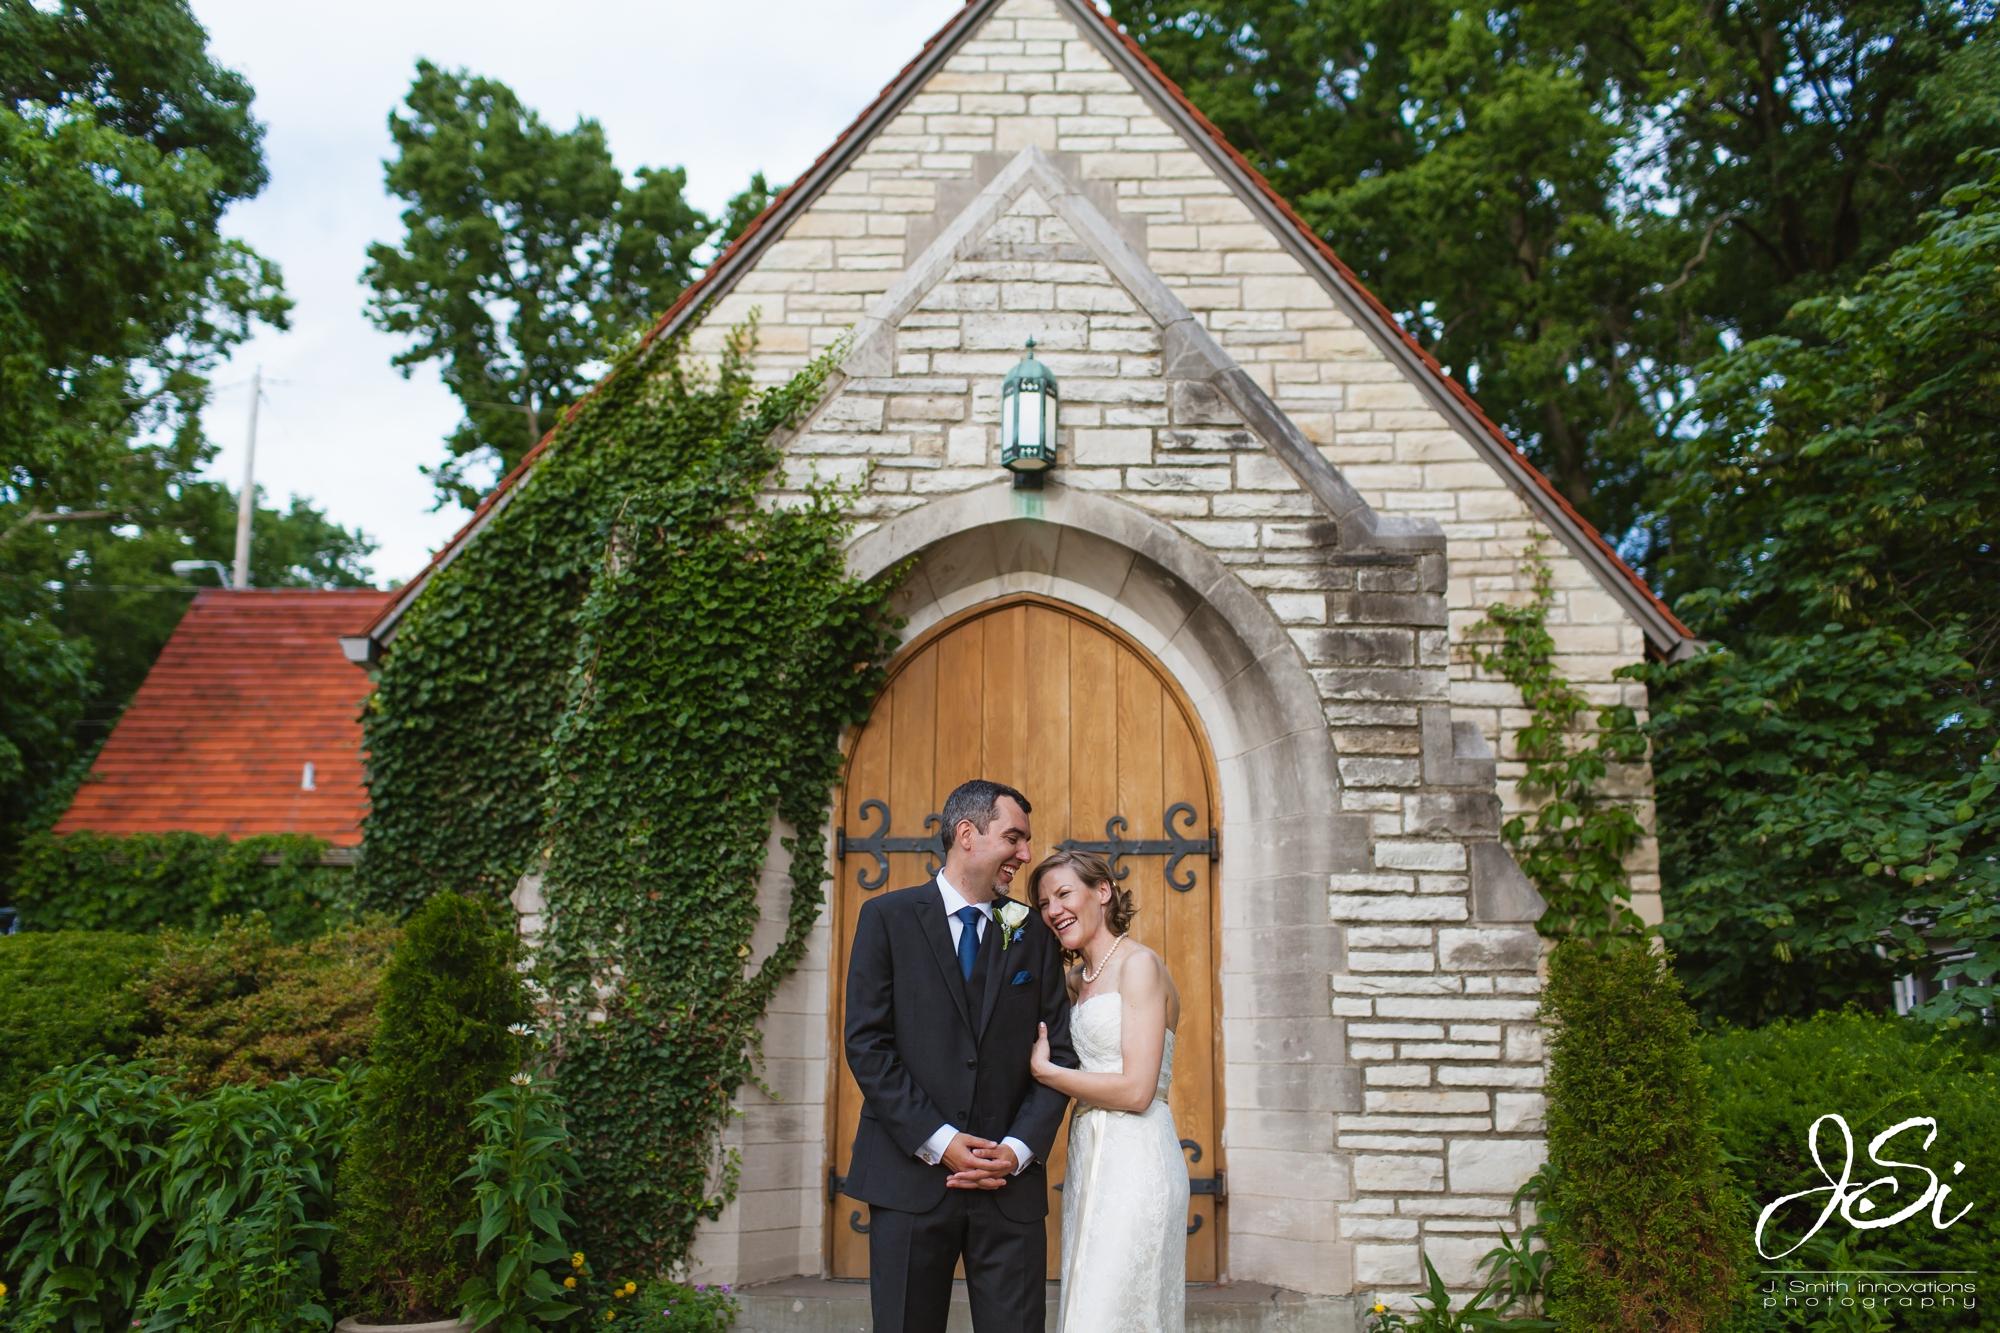 KC husband and wife wedding photographer team photo blog